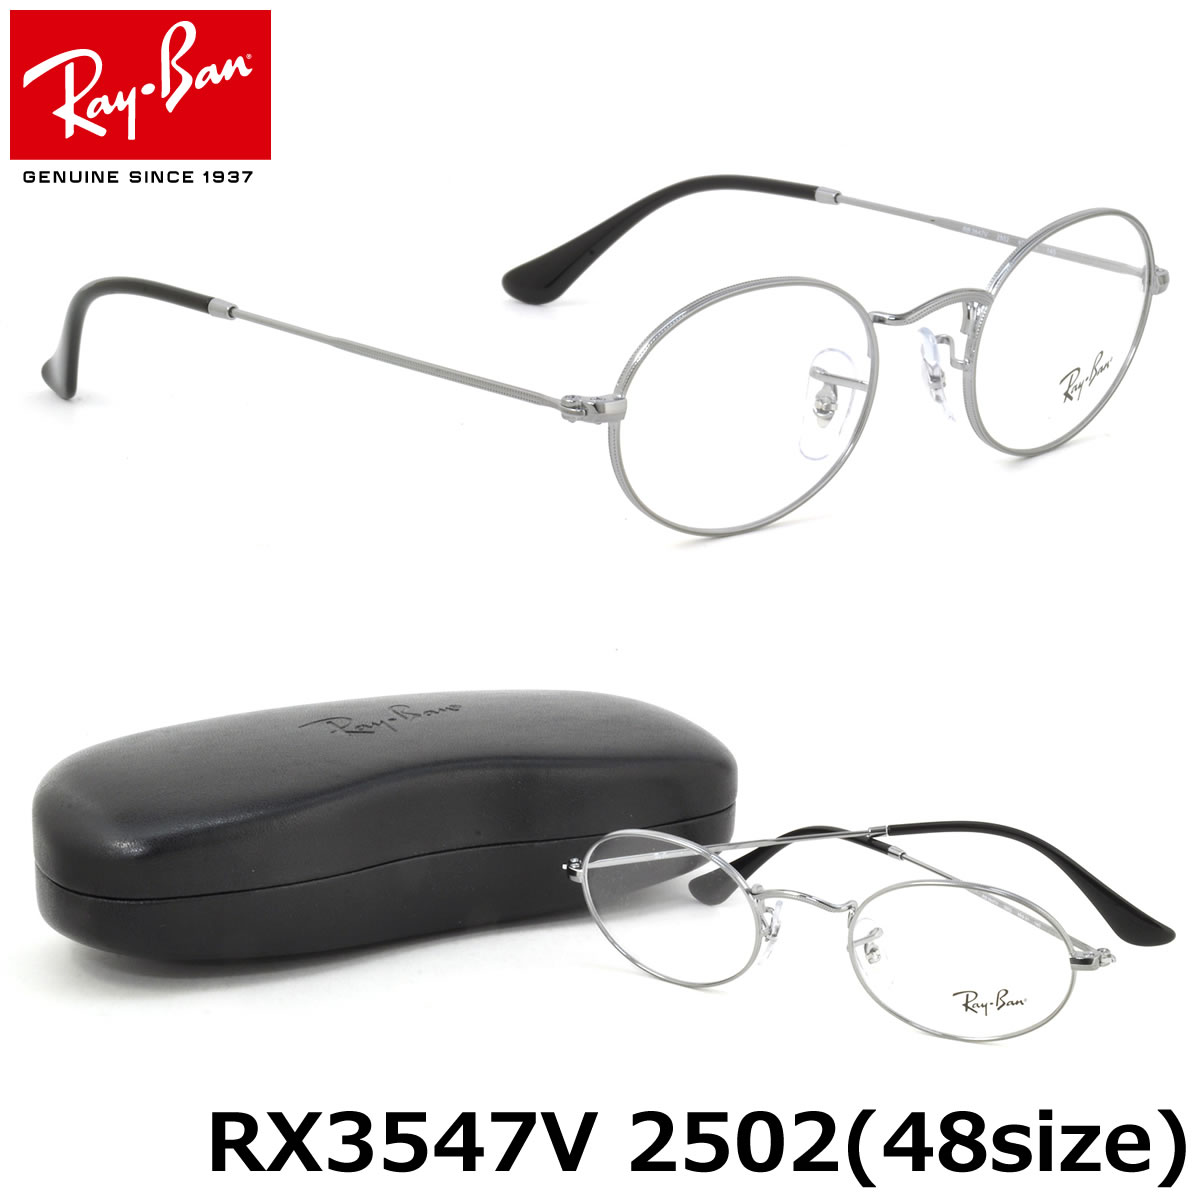 201a6b031e4d2 Optical Shop Thats  Ray-Ban glasses RX3547V 2502 48 size